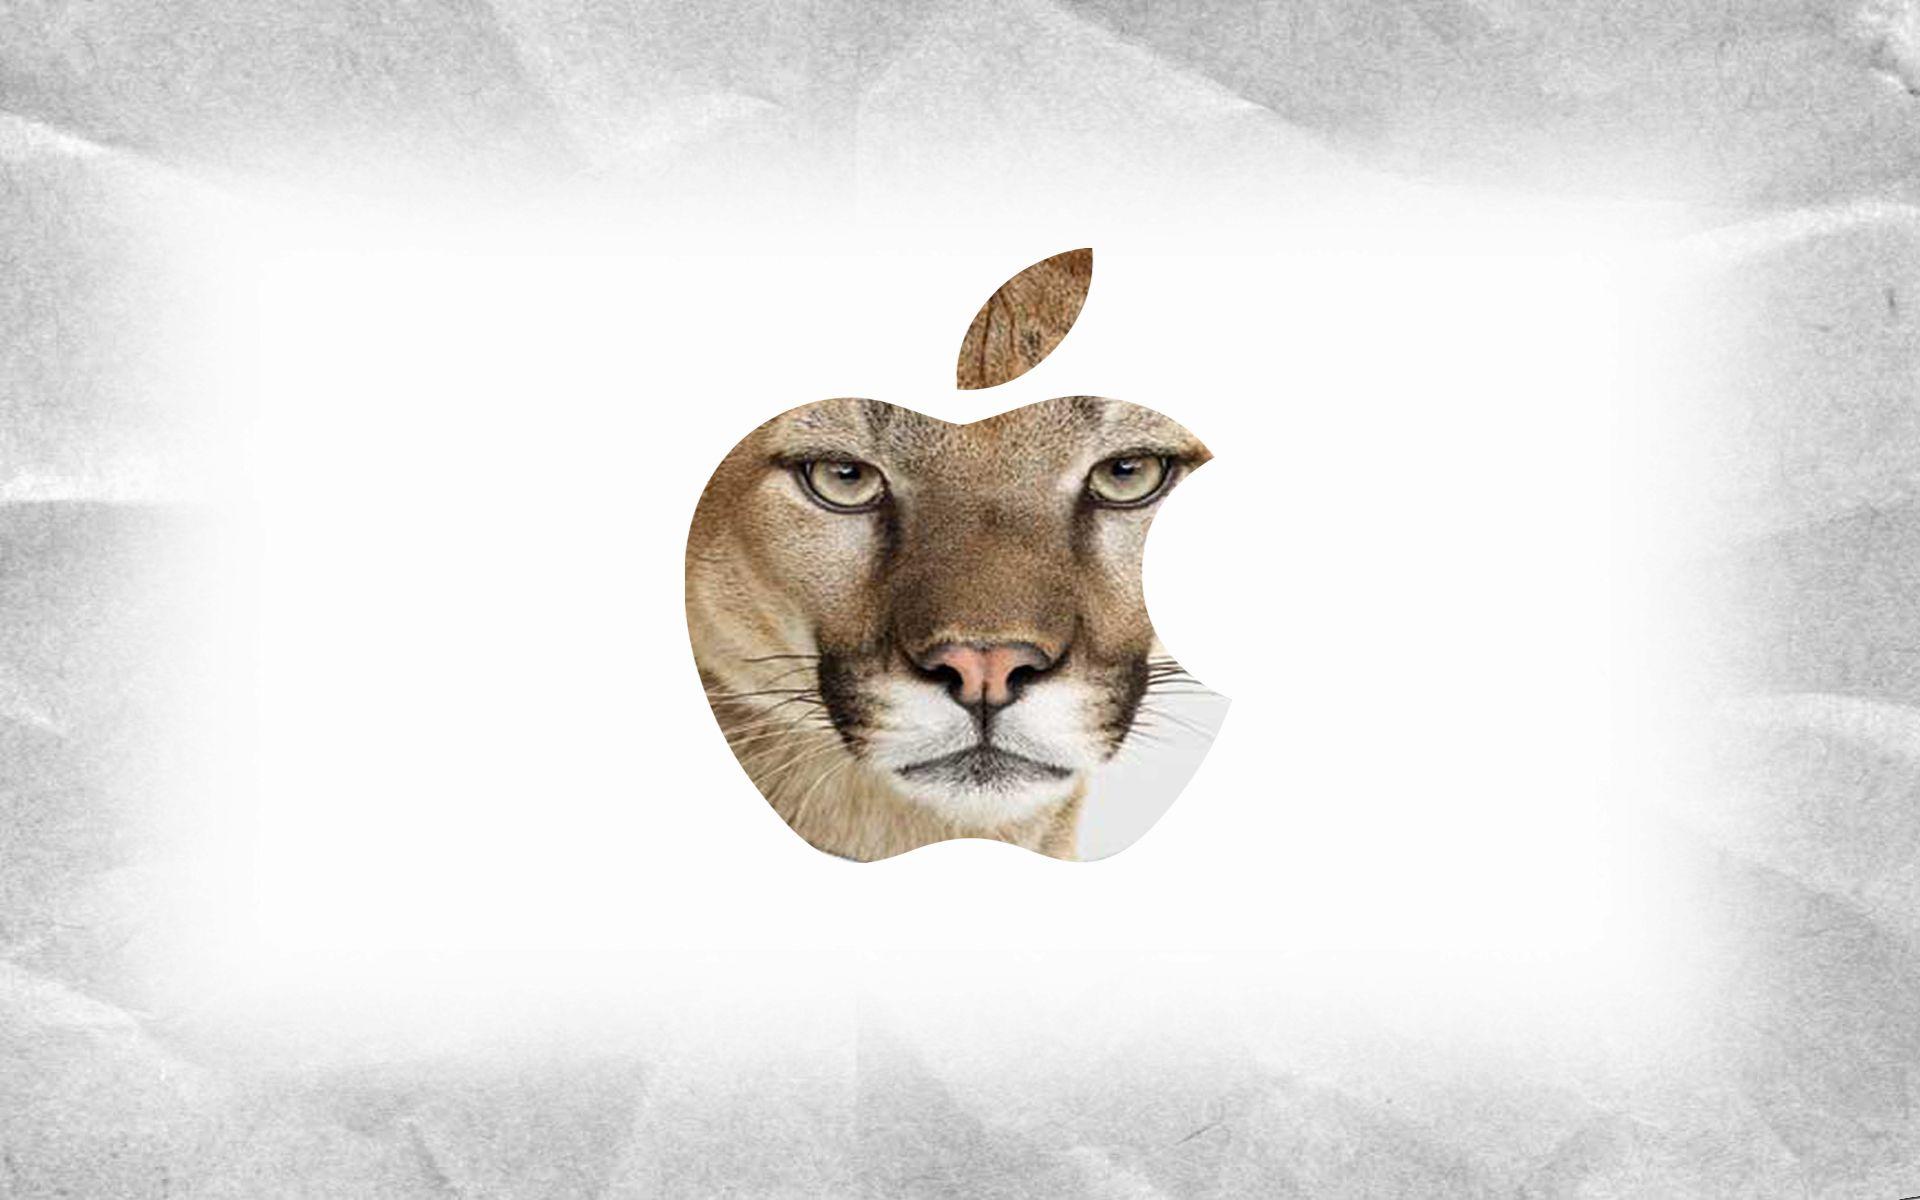 Best Wallpaper Macbook Lion - 9dac728bc3d51e41294ec20486bf1a4d  You Should Have_303911.jpg